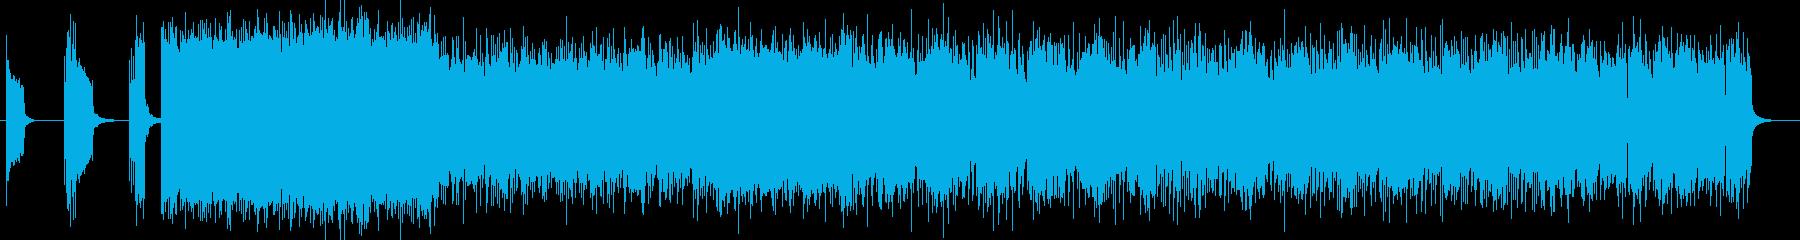 DARK、重低音系のDEATH ROCKの再生済みの波形